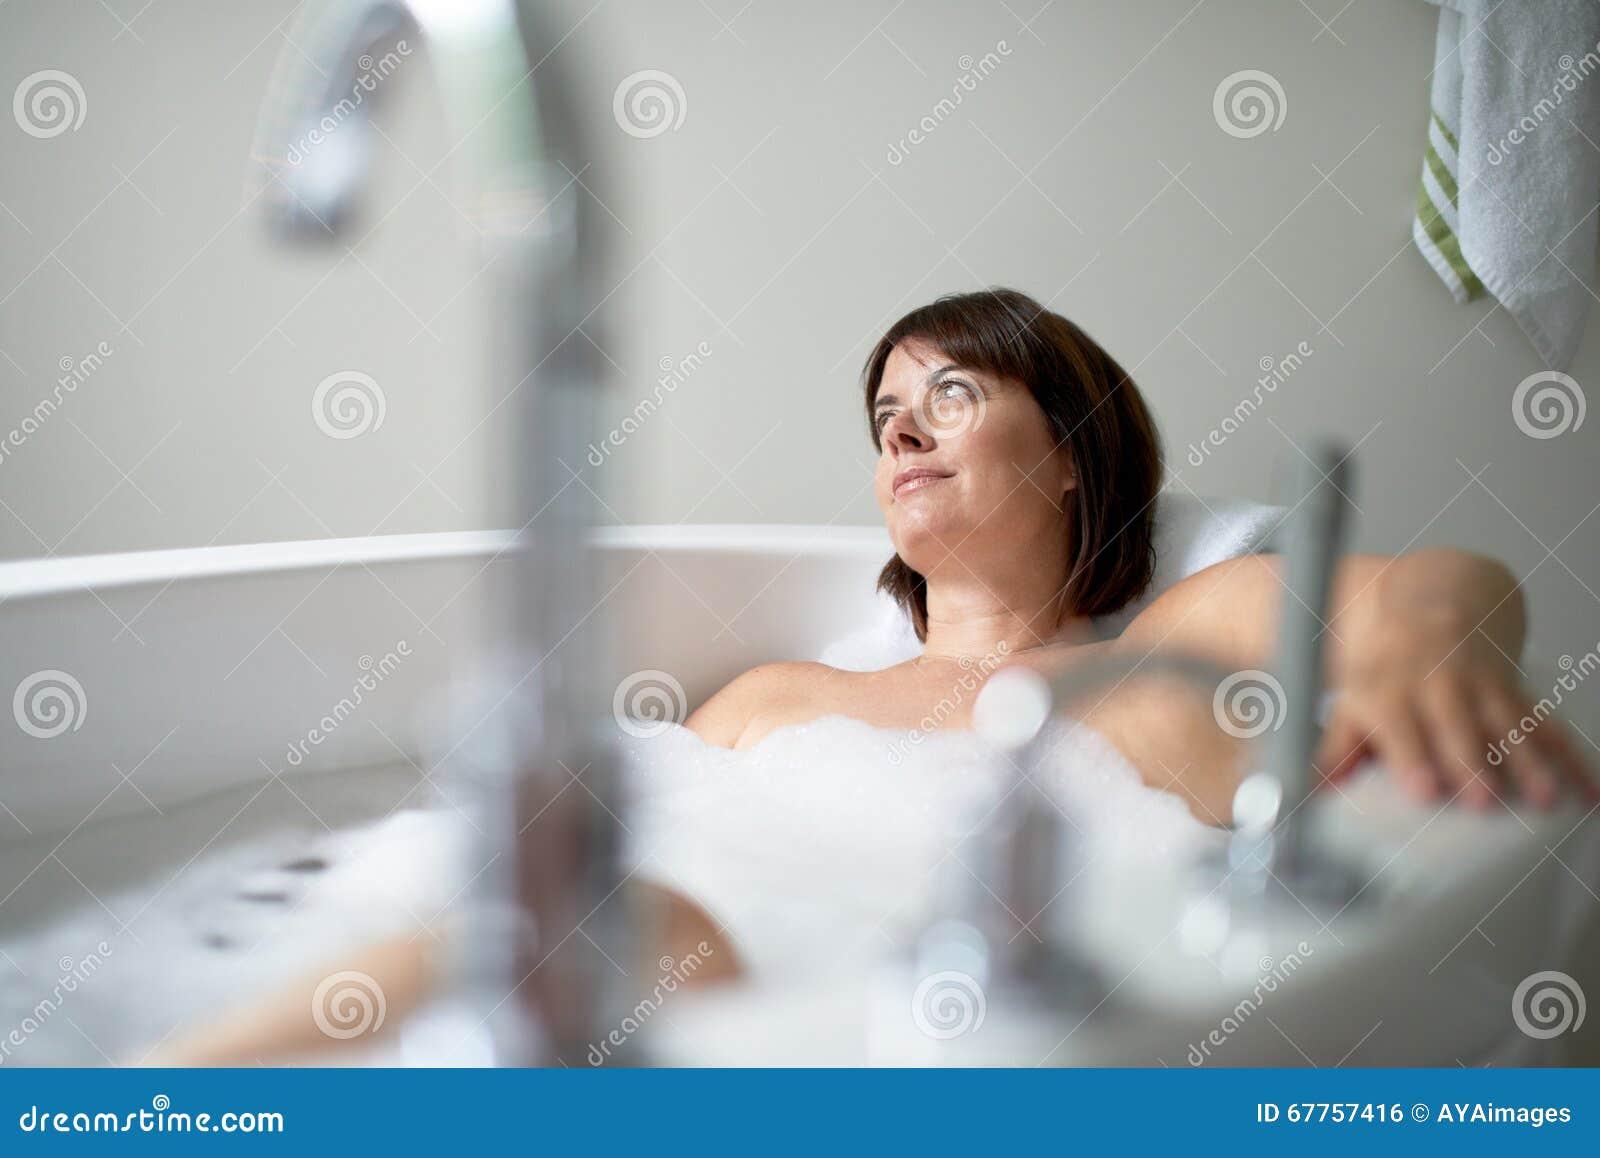 Best polish dating website ukraine